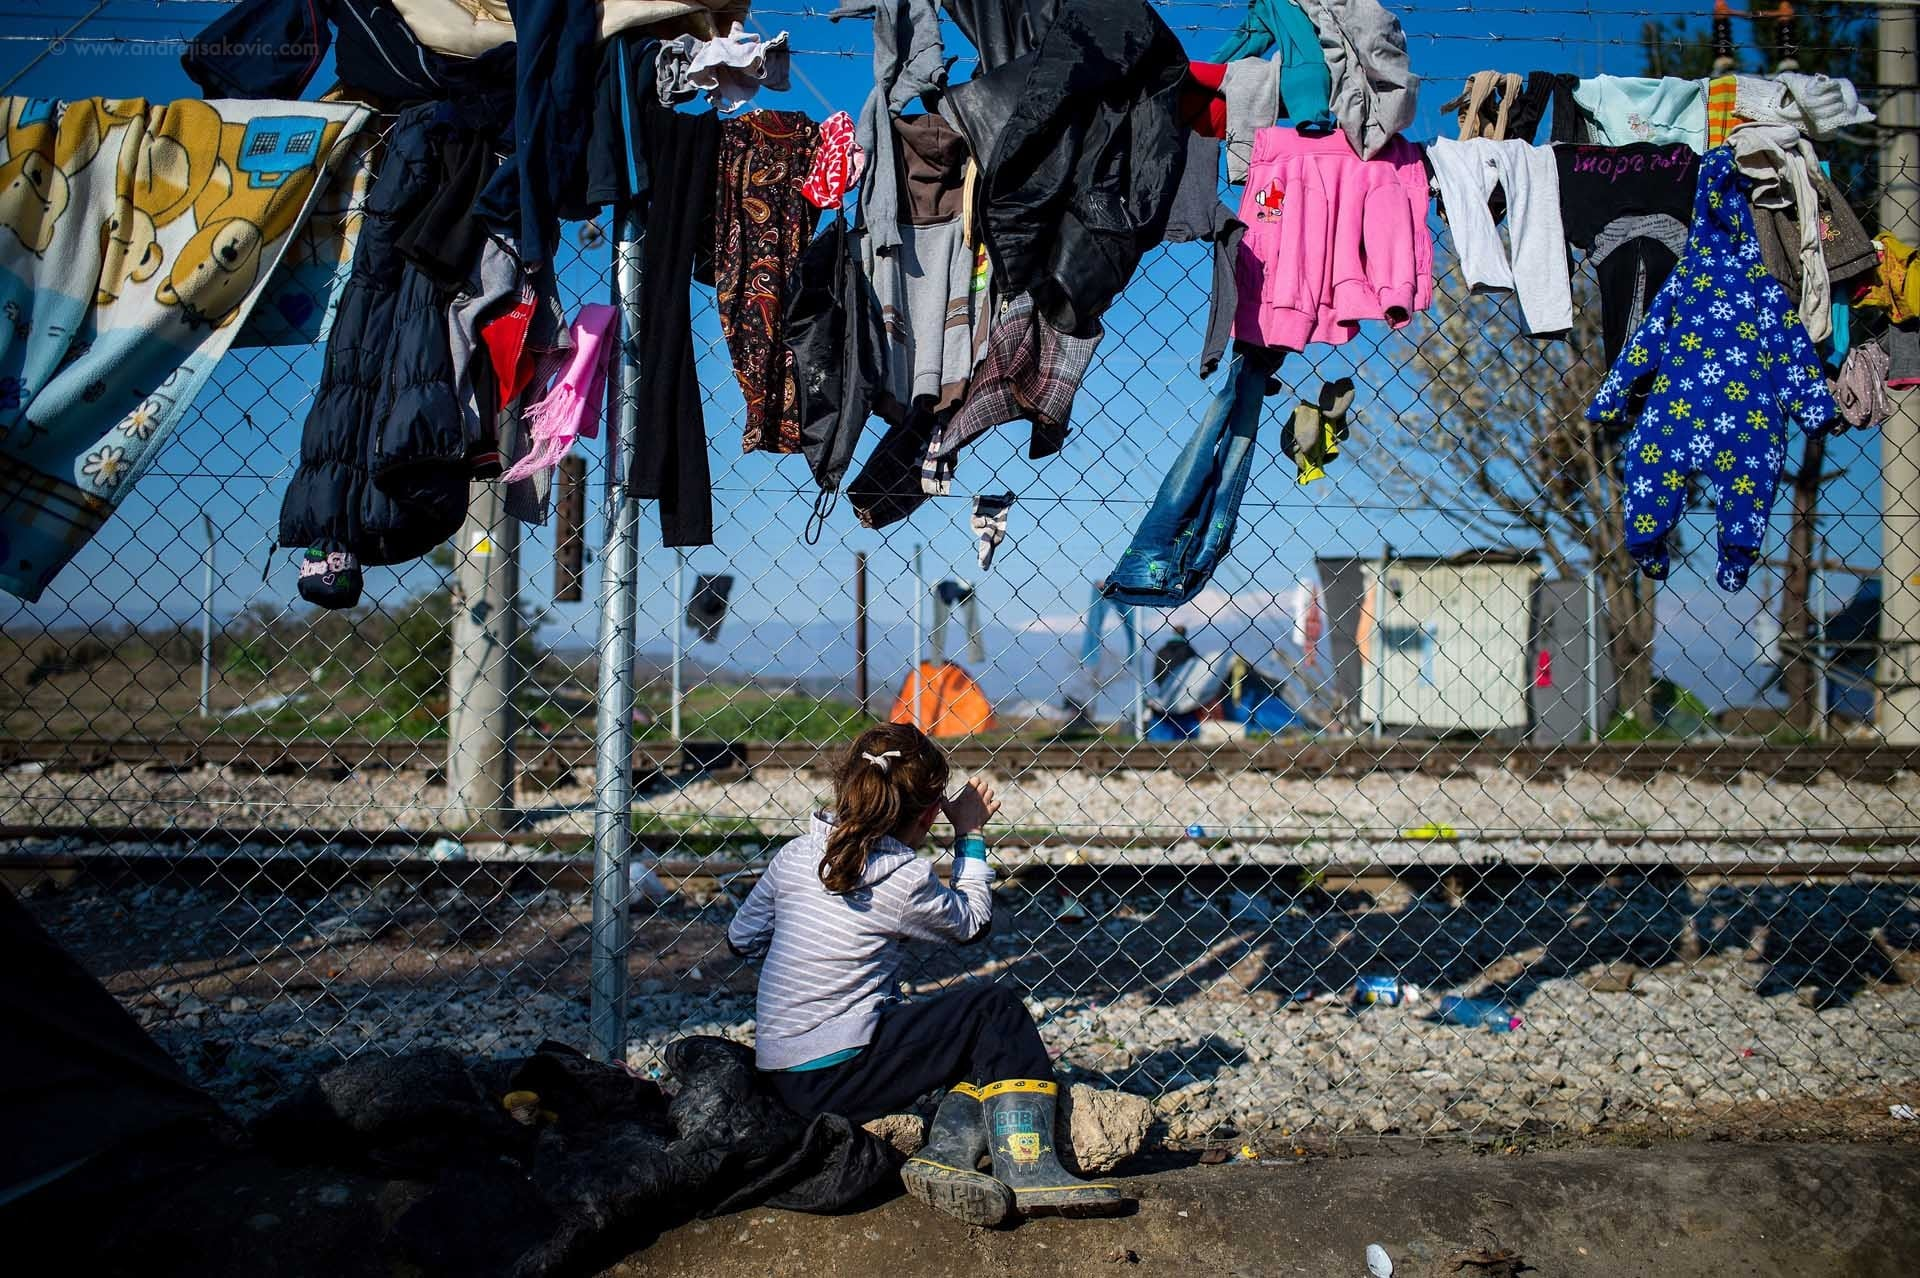 Forgotten in Idomeni